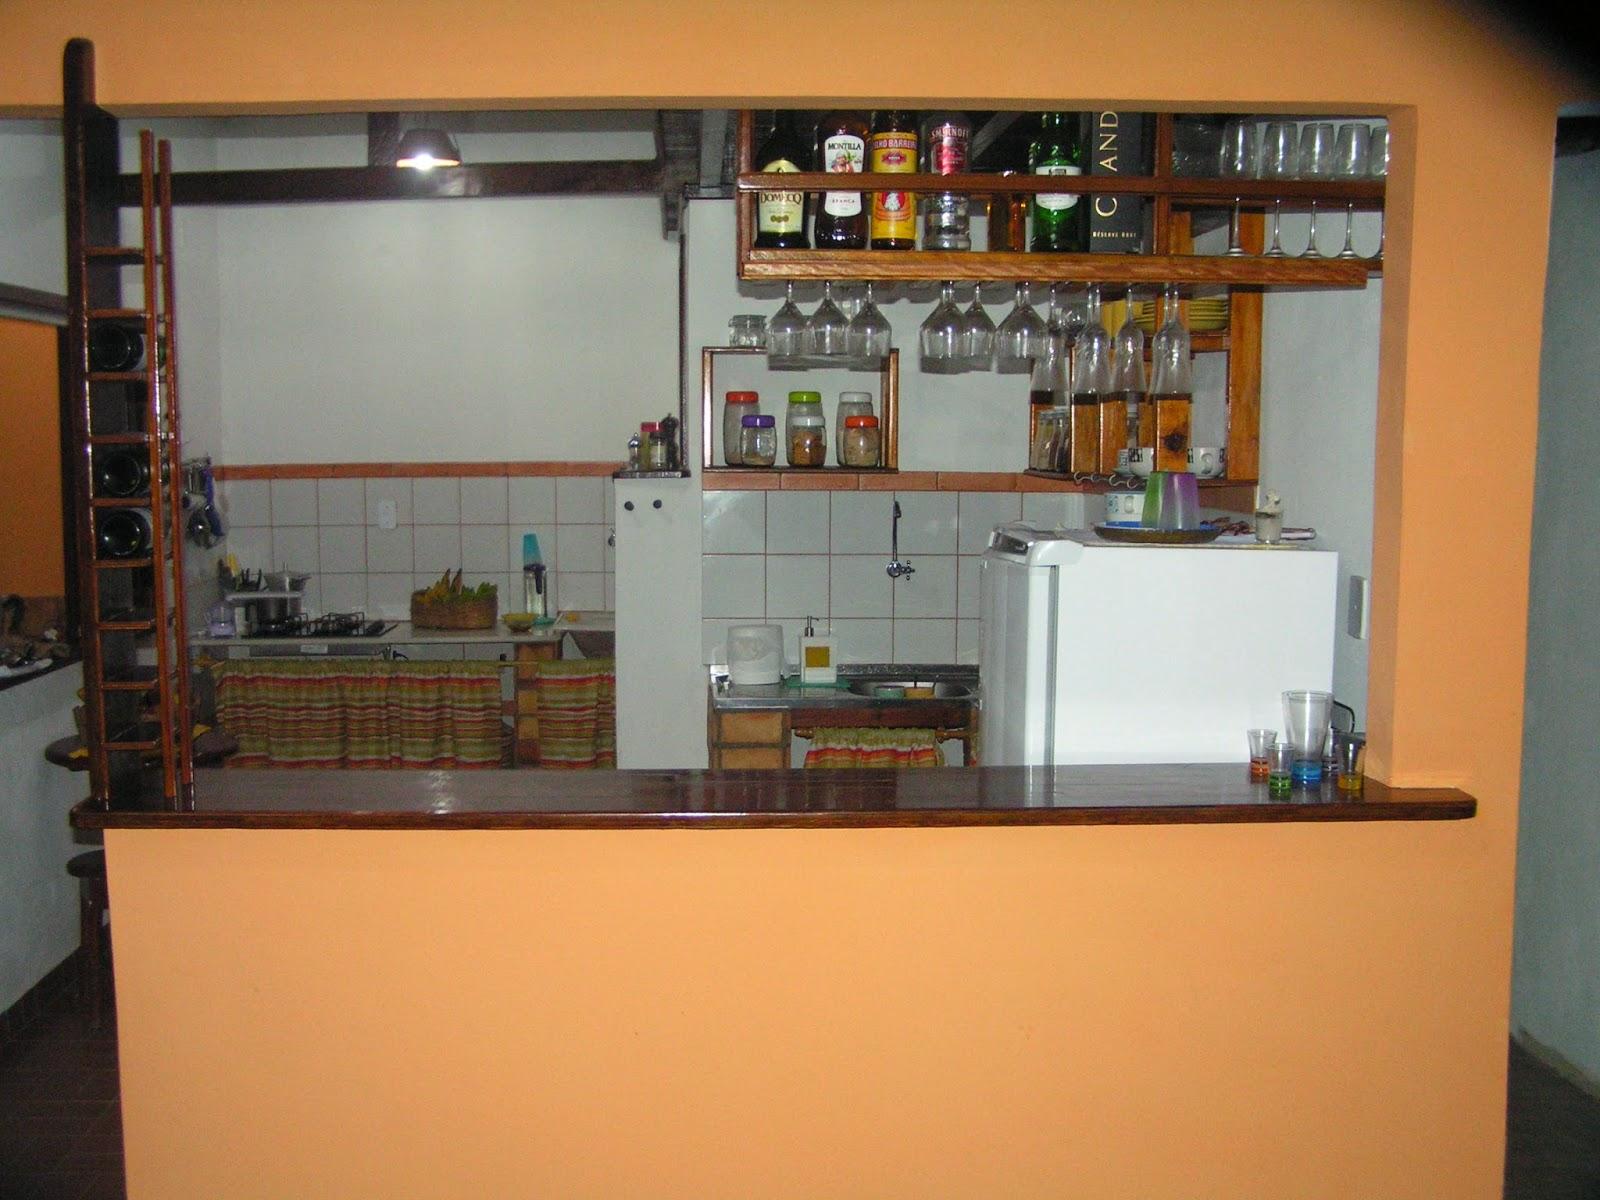 TENNER: Projeto Bancada Cozinha Americana Rustica #AC621F 1600 1200